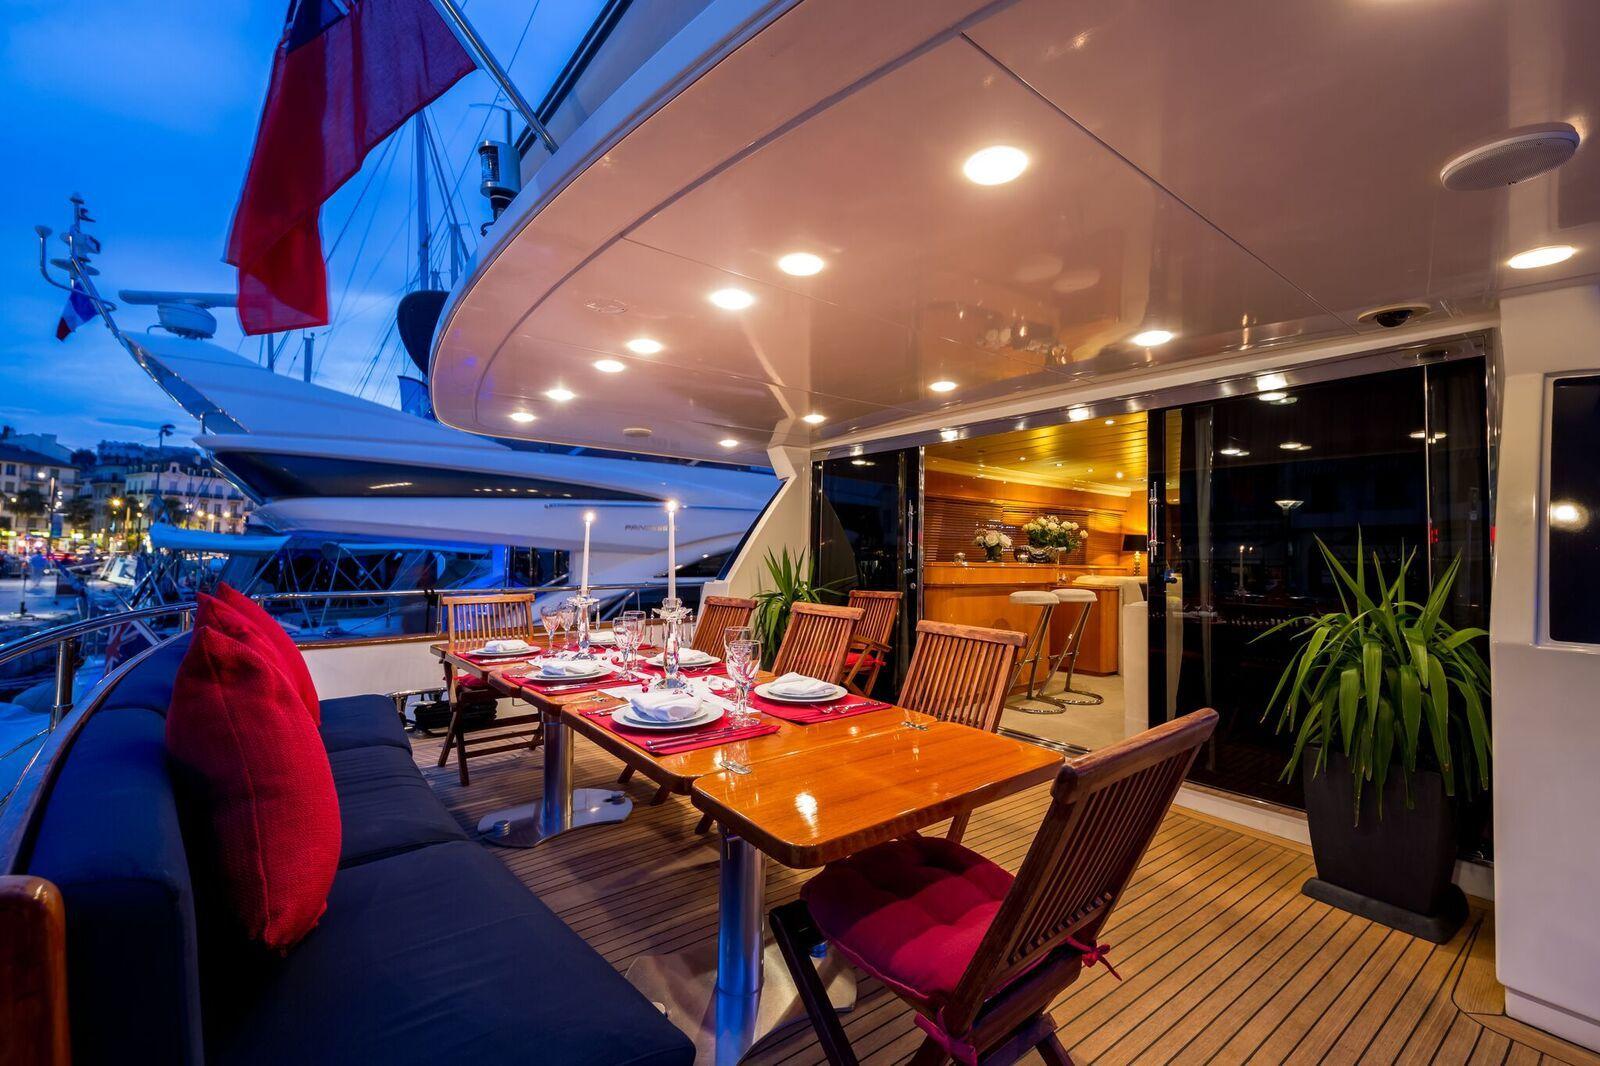 INDULGENCE OF POOLE Mangusta 86 Luxury Superyacht Aft Deck Dining